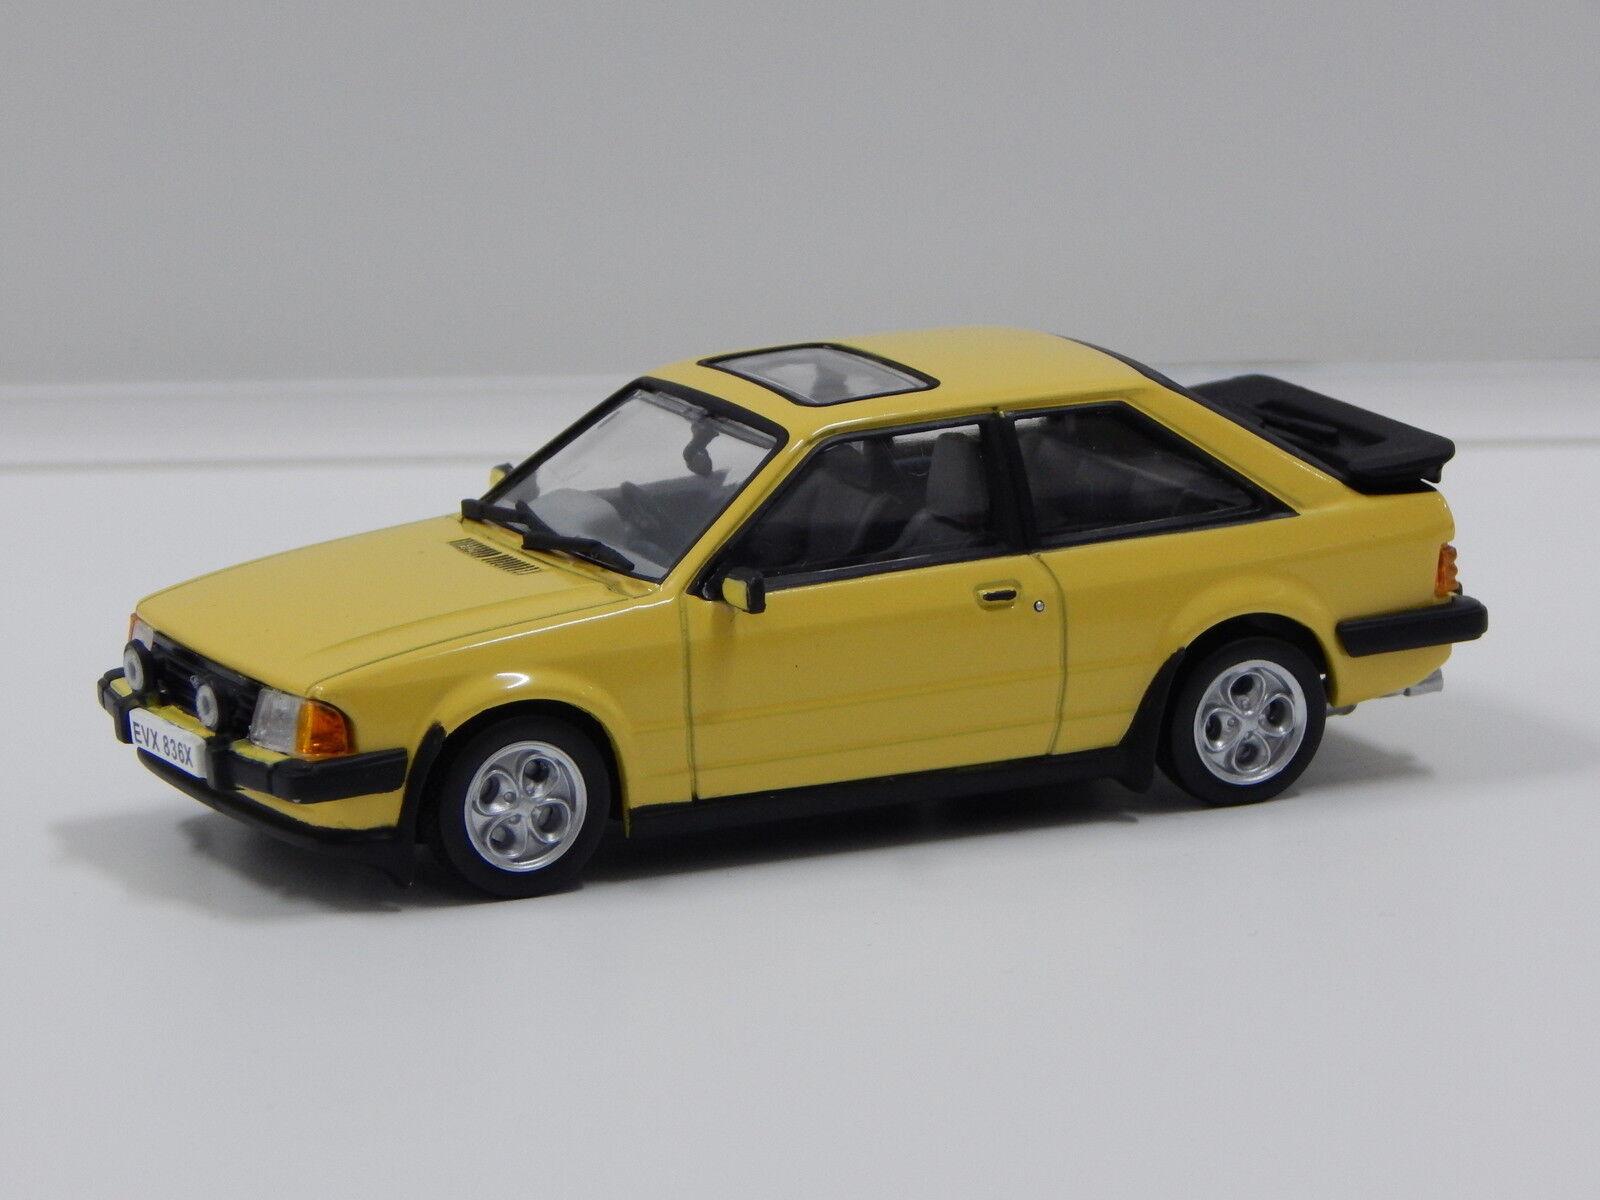 1 43 1981 Ford Escort Mk3 XR3 (Prairie Yellow) Vitesse 24836R